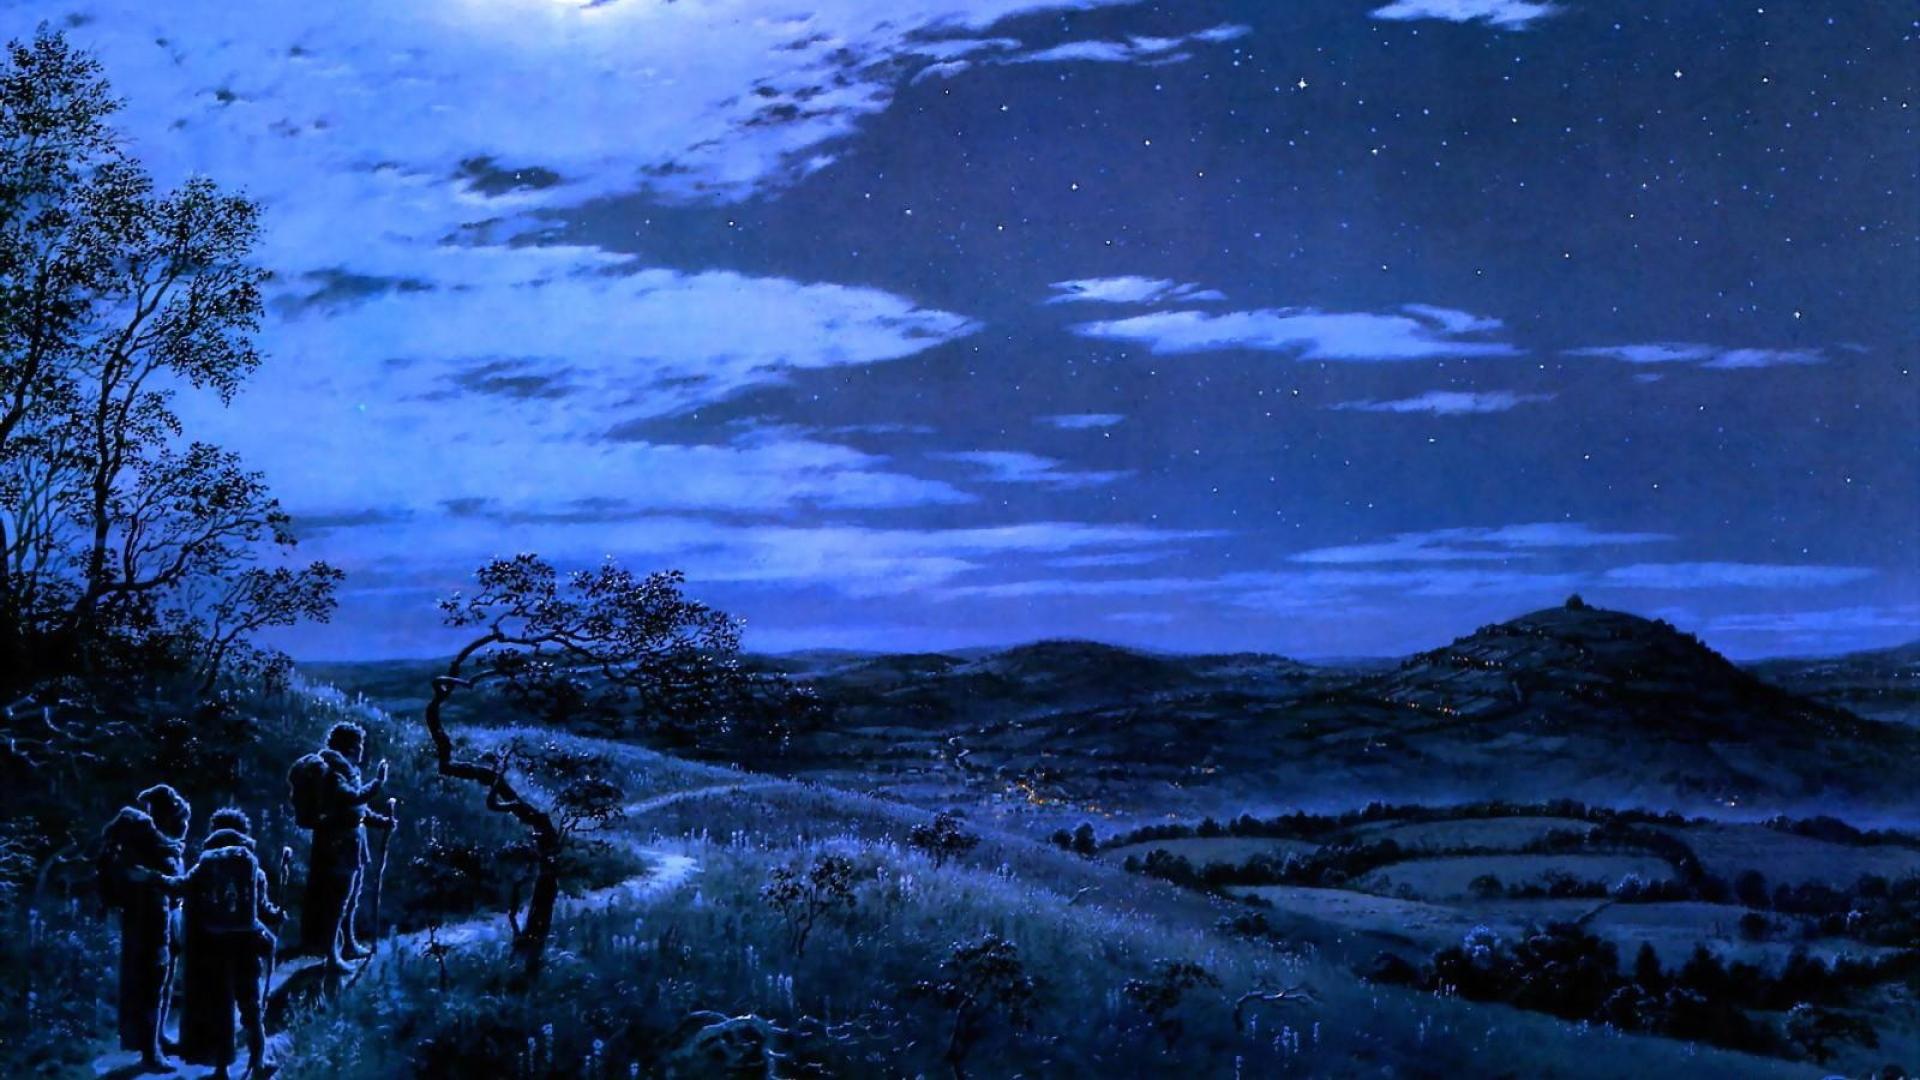 Download Wallpaper 1920x1080 Night Moon Travelers Trail Nature Full Hd 1080p Hd Background